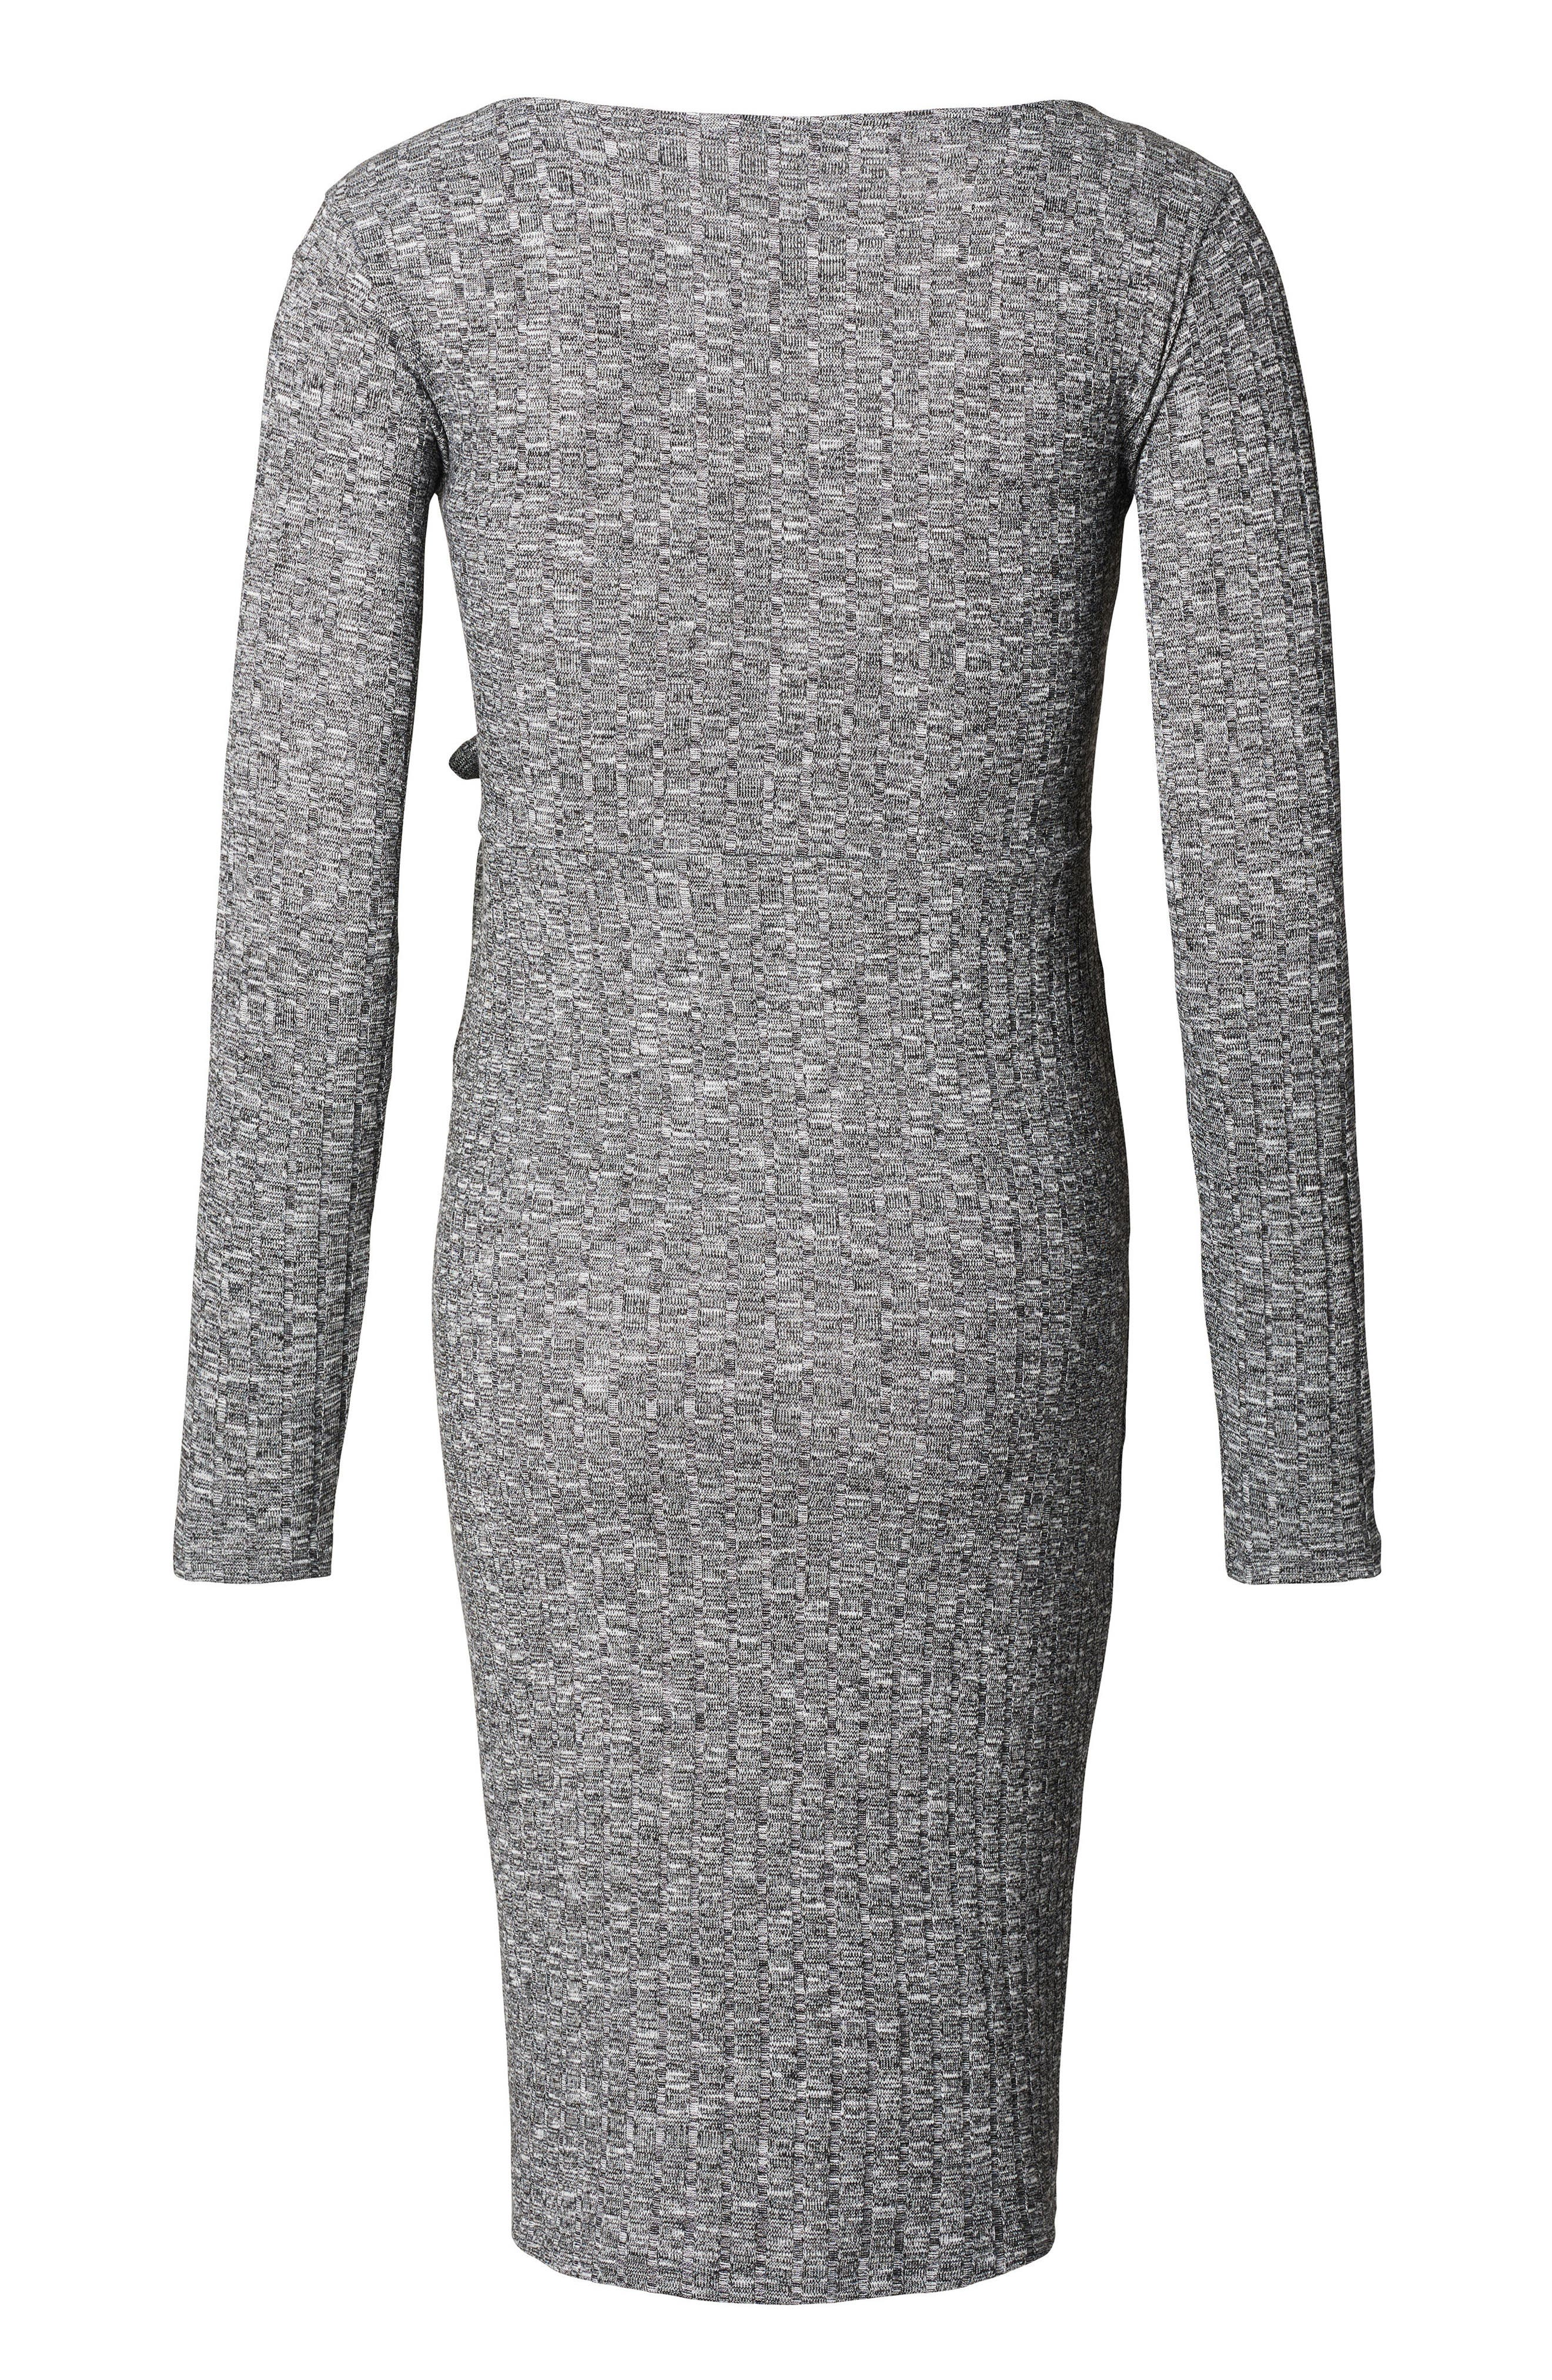 Noppies Giulia Maternity Sweater Dress, Grey